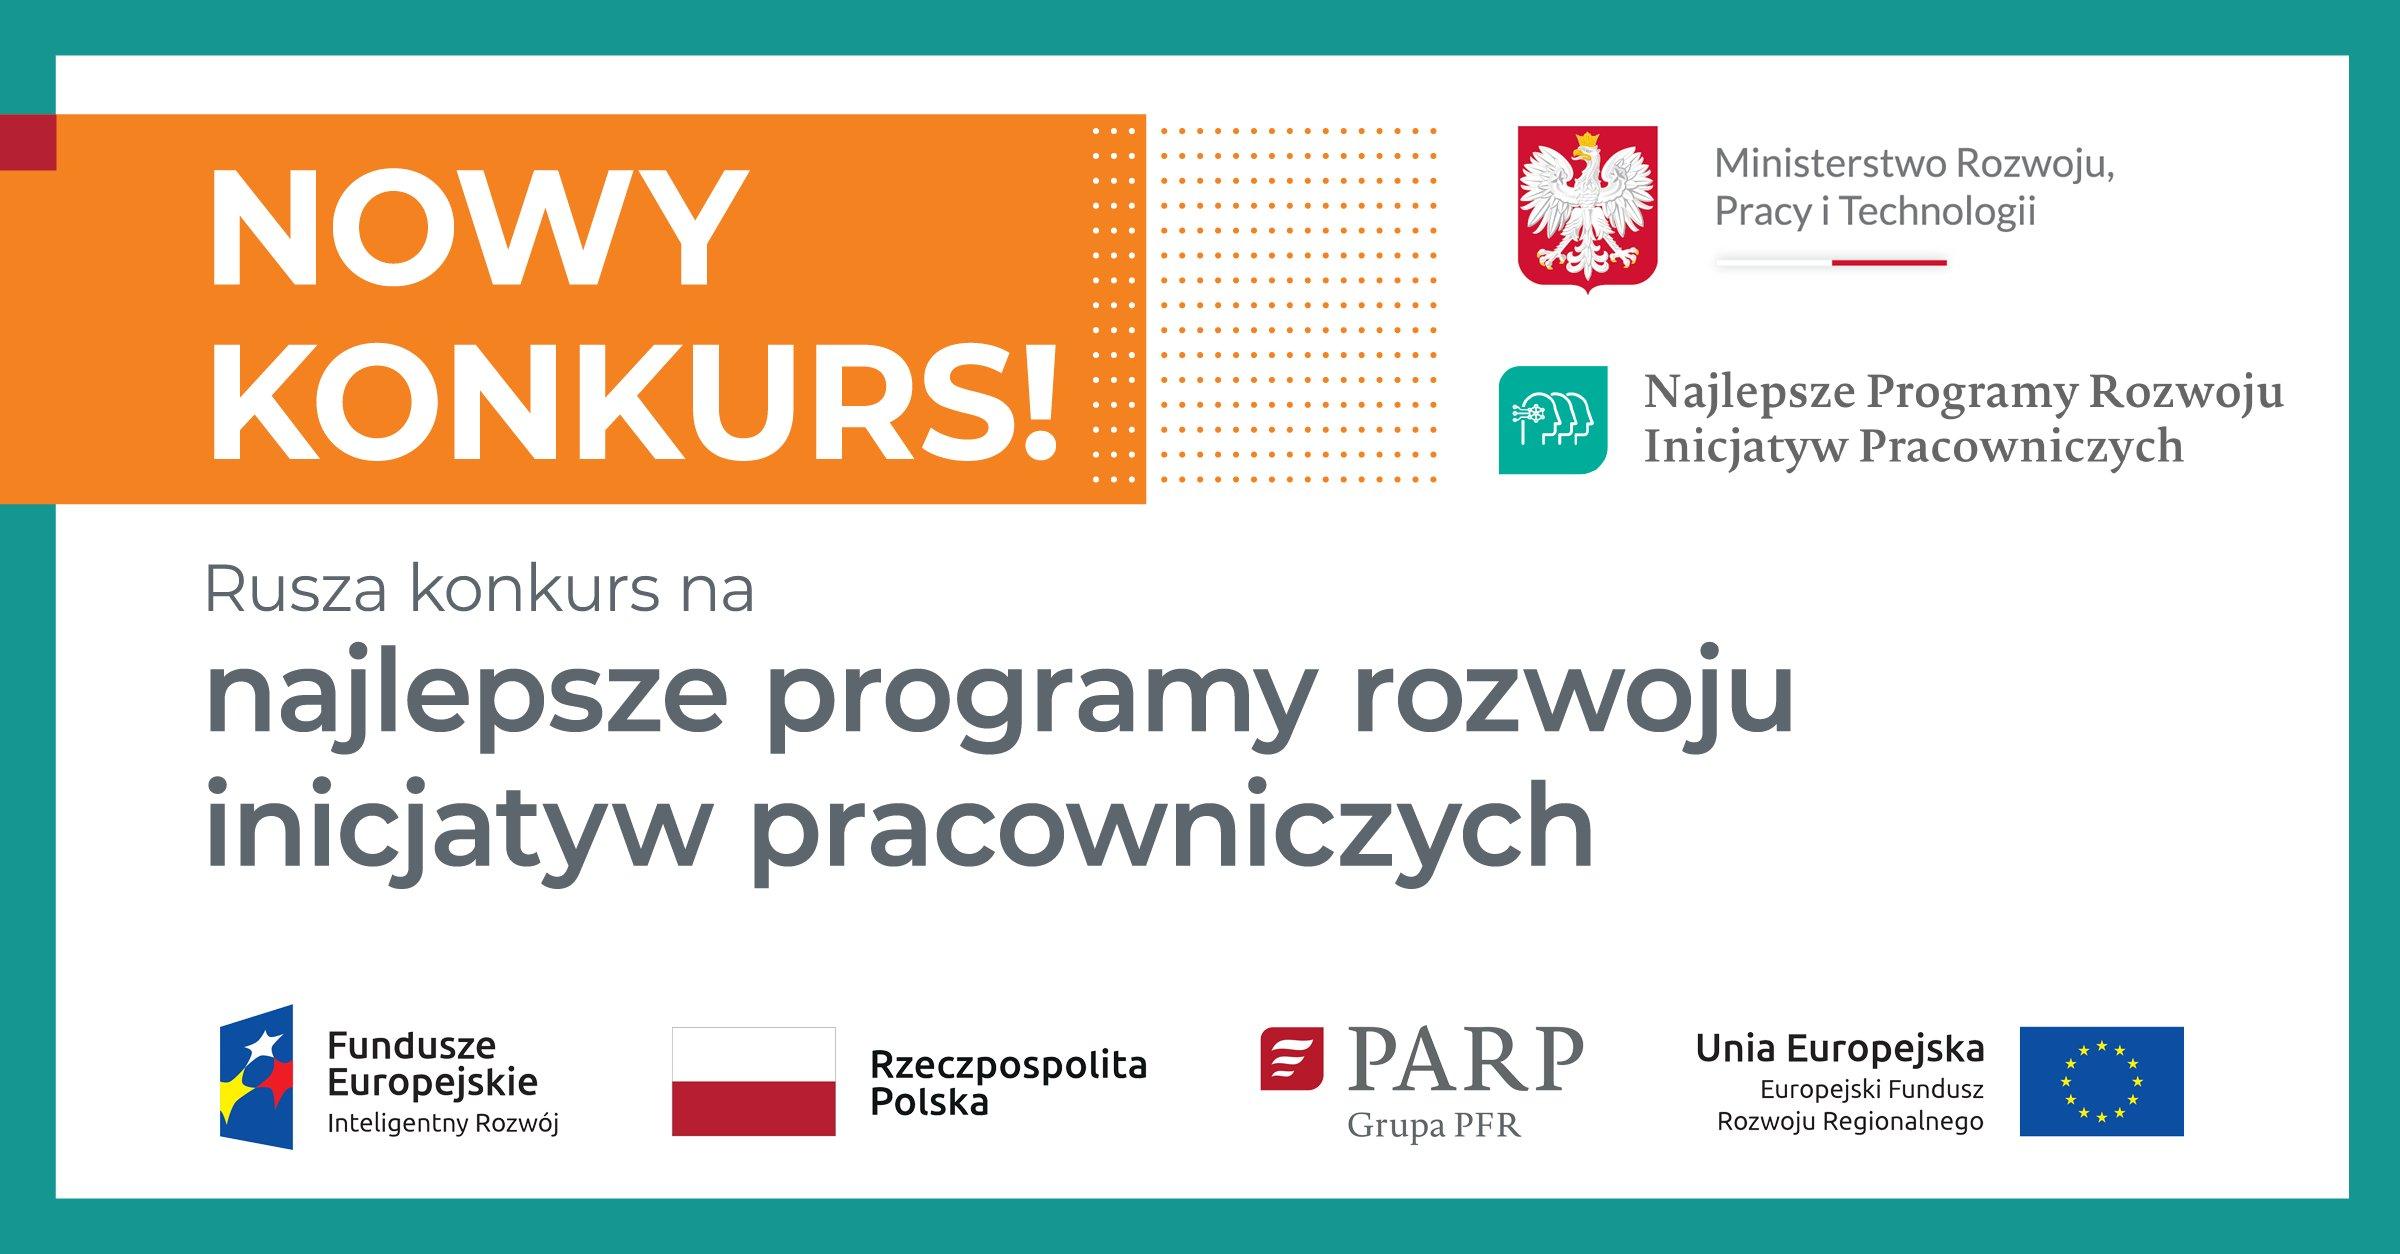 https://m.powiatszczycienski.pl/2021/08/orig/e7xnjbtxsagh-xk-42584.jpg